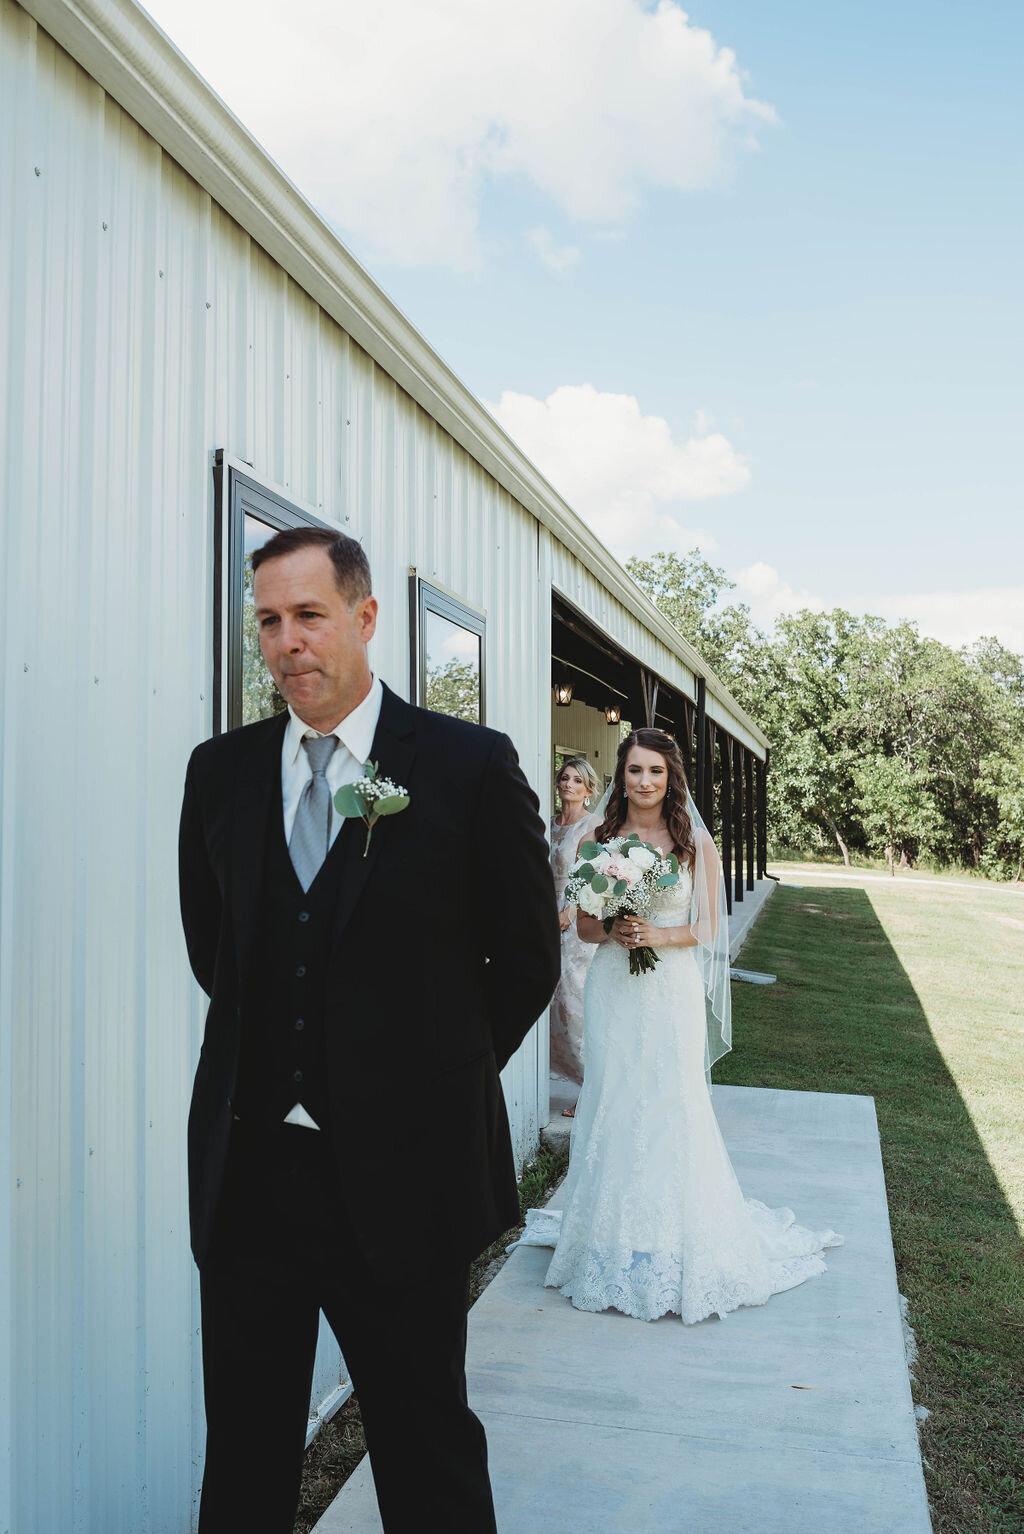 Tulsa Wedding Venue with a View 00.jpg